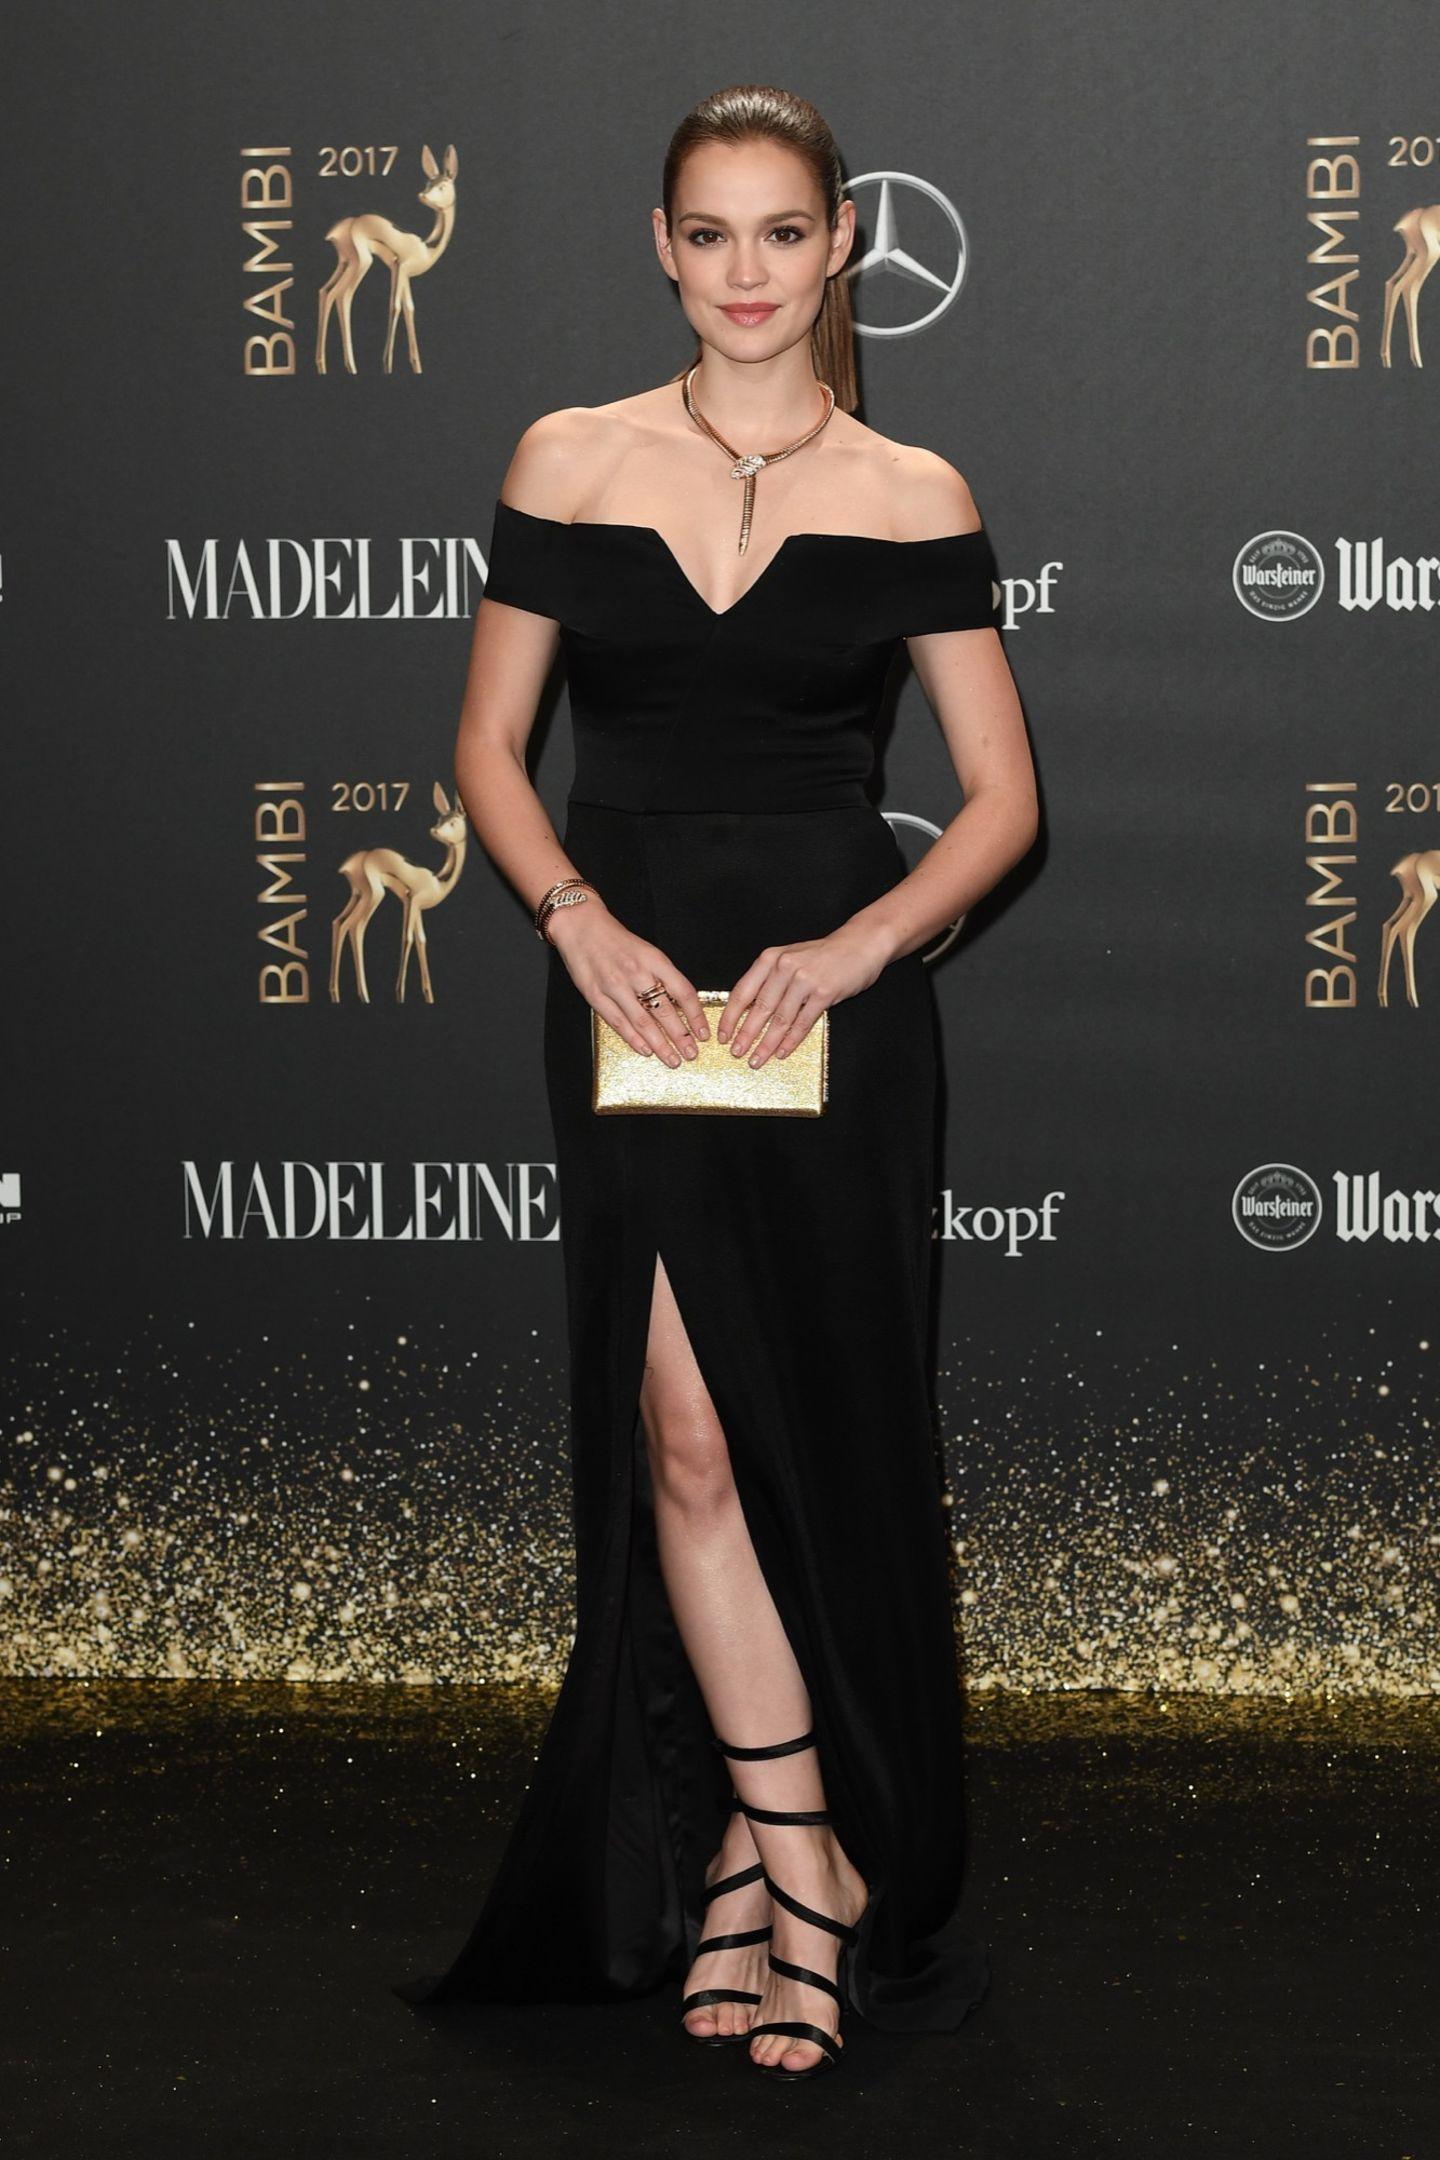 Bambi 2017: Emilia Schüle auf dem Roten Teppich